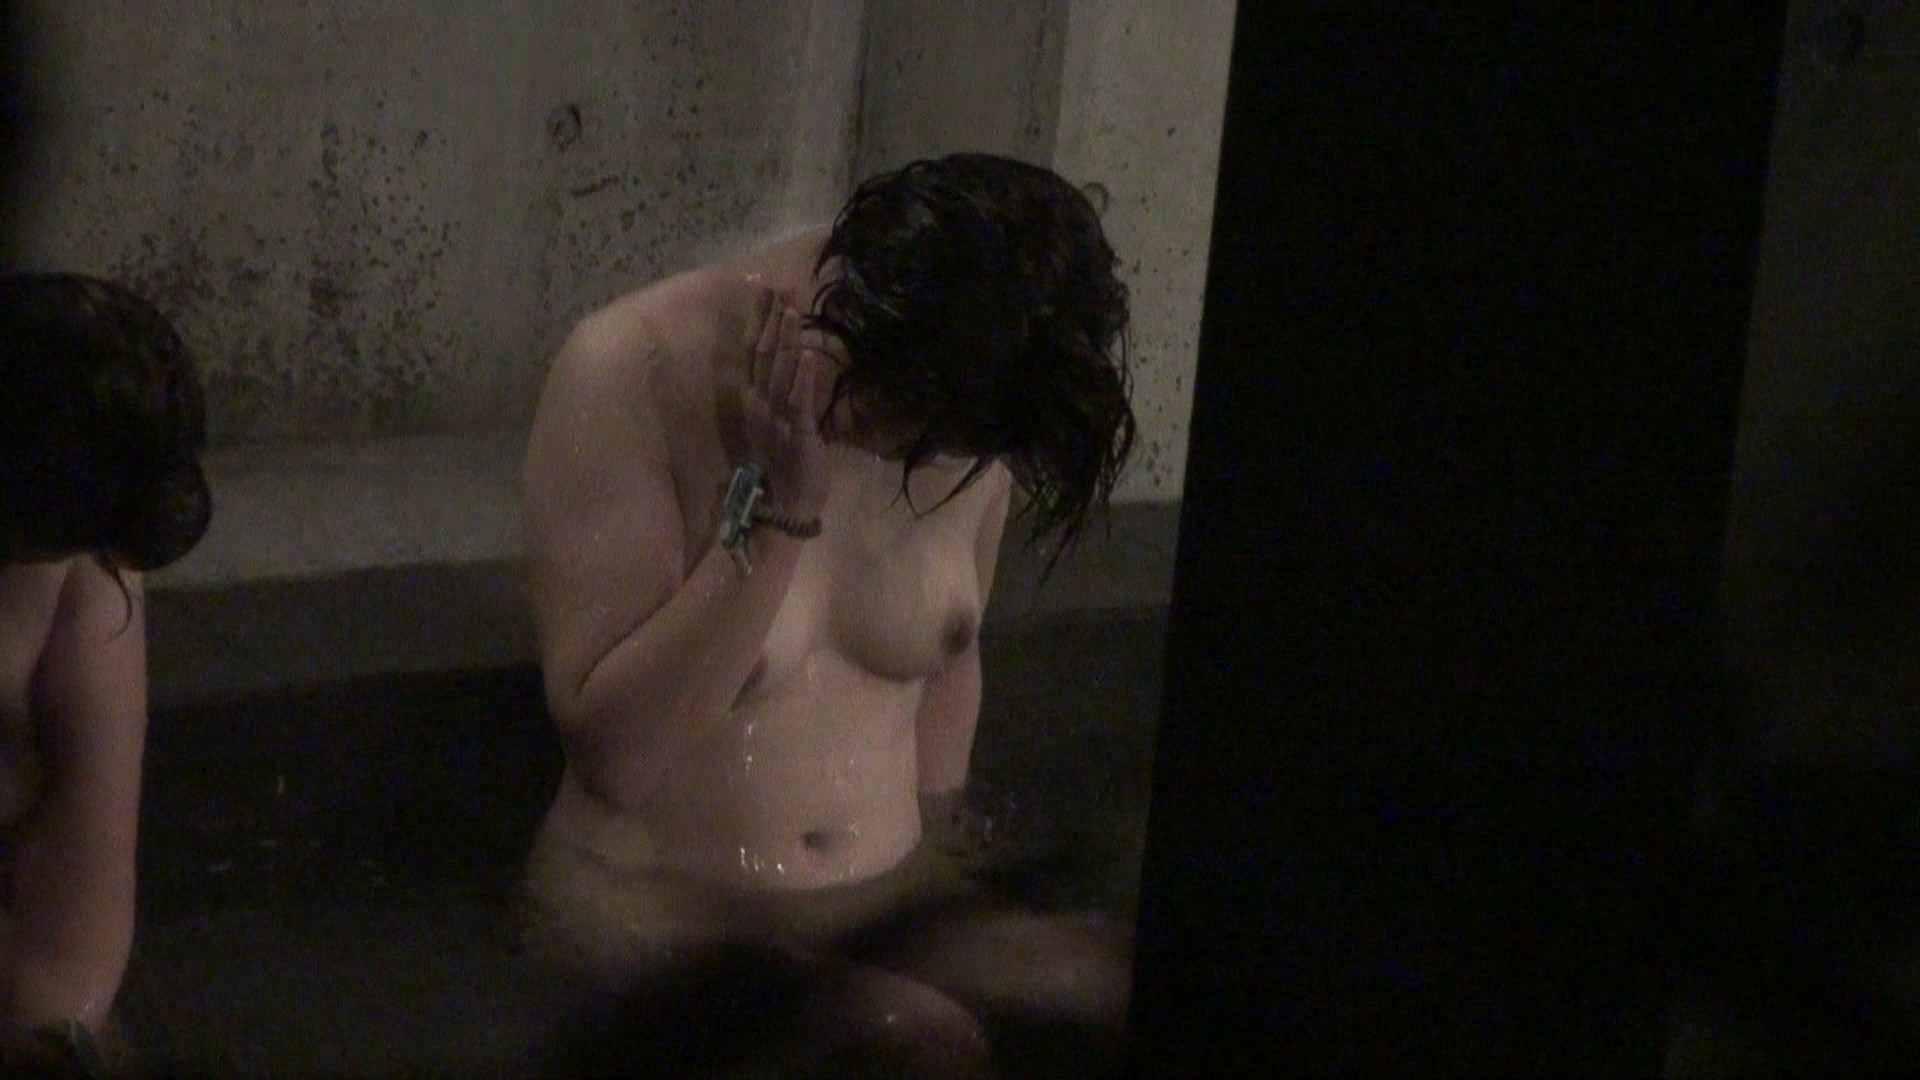 Aquaな露天風呂Vol.389 OLセックス   盗撮  84画像 40